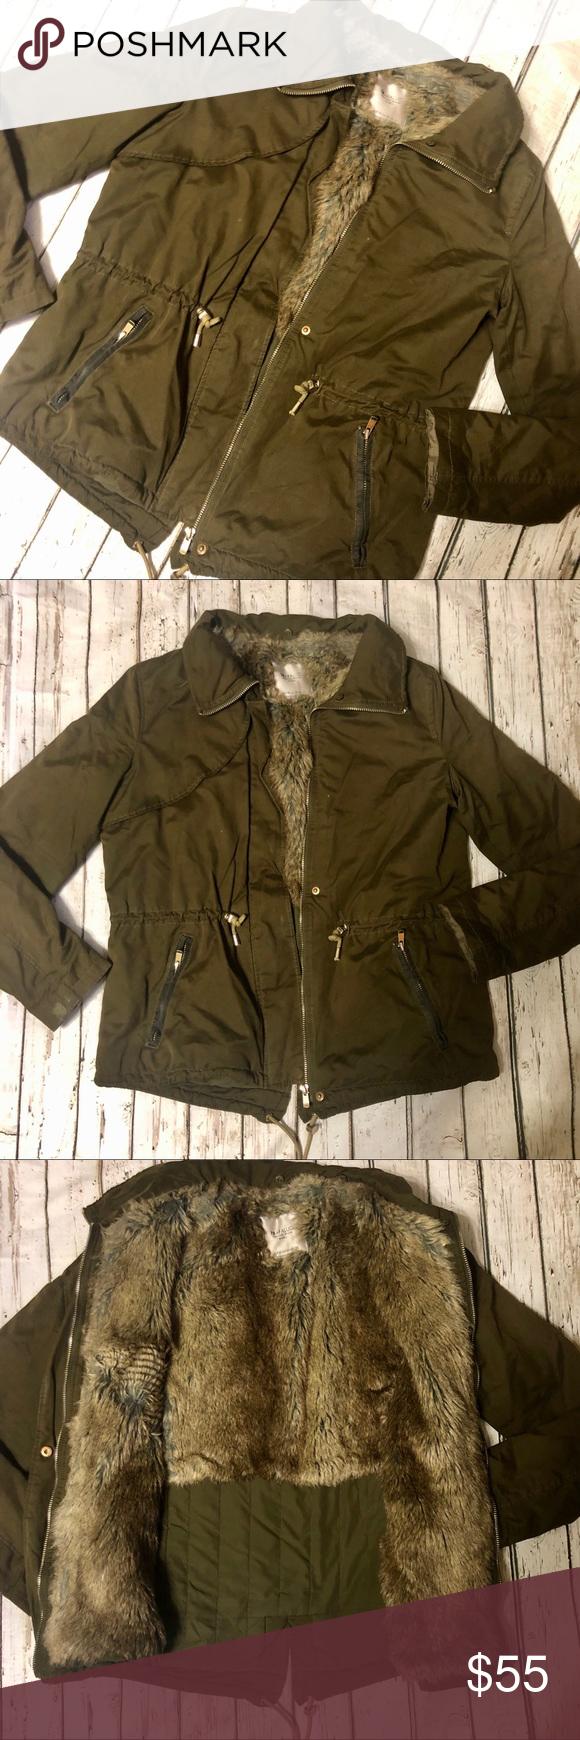 Zara Tfl Outerwear Division Jacket Zara Trafaluc Jacket With Faux Fur Lining Olive Green Zip Up Closer Small Hole At The Stitching Zara Jackets Zara Jackets [ 1740 x 580 Pixel ]